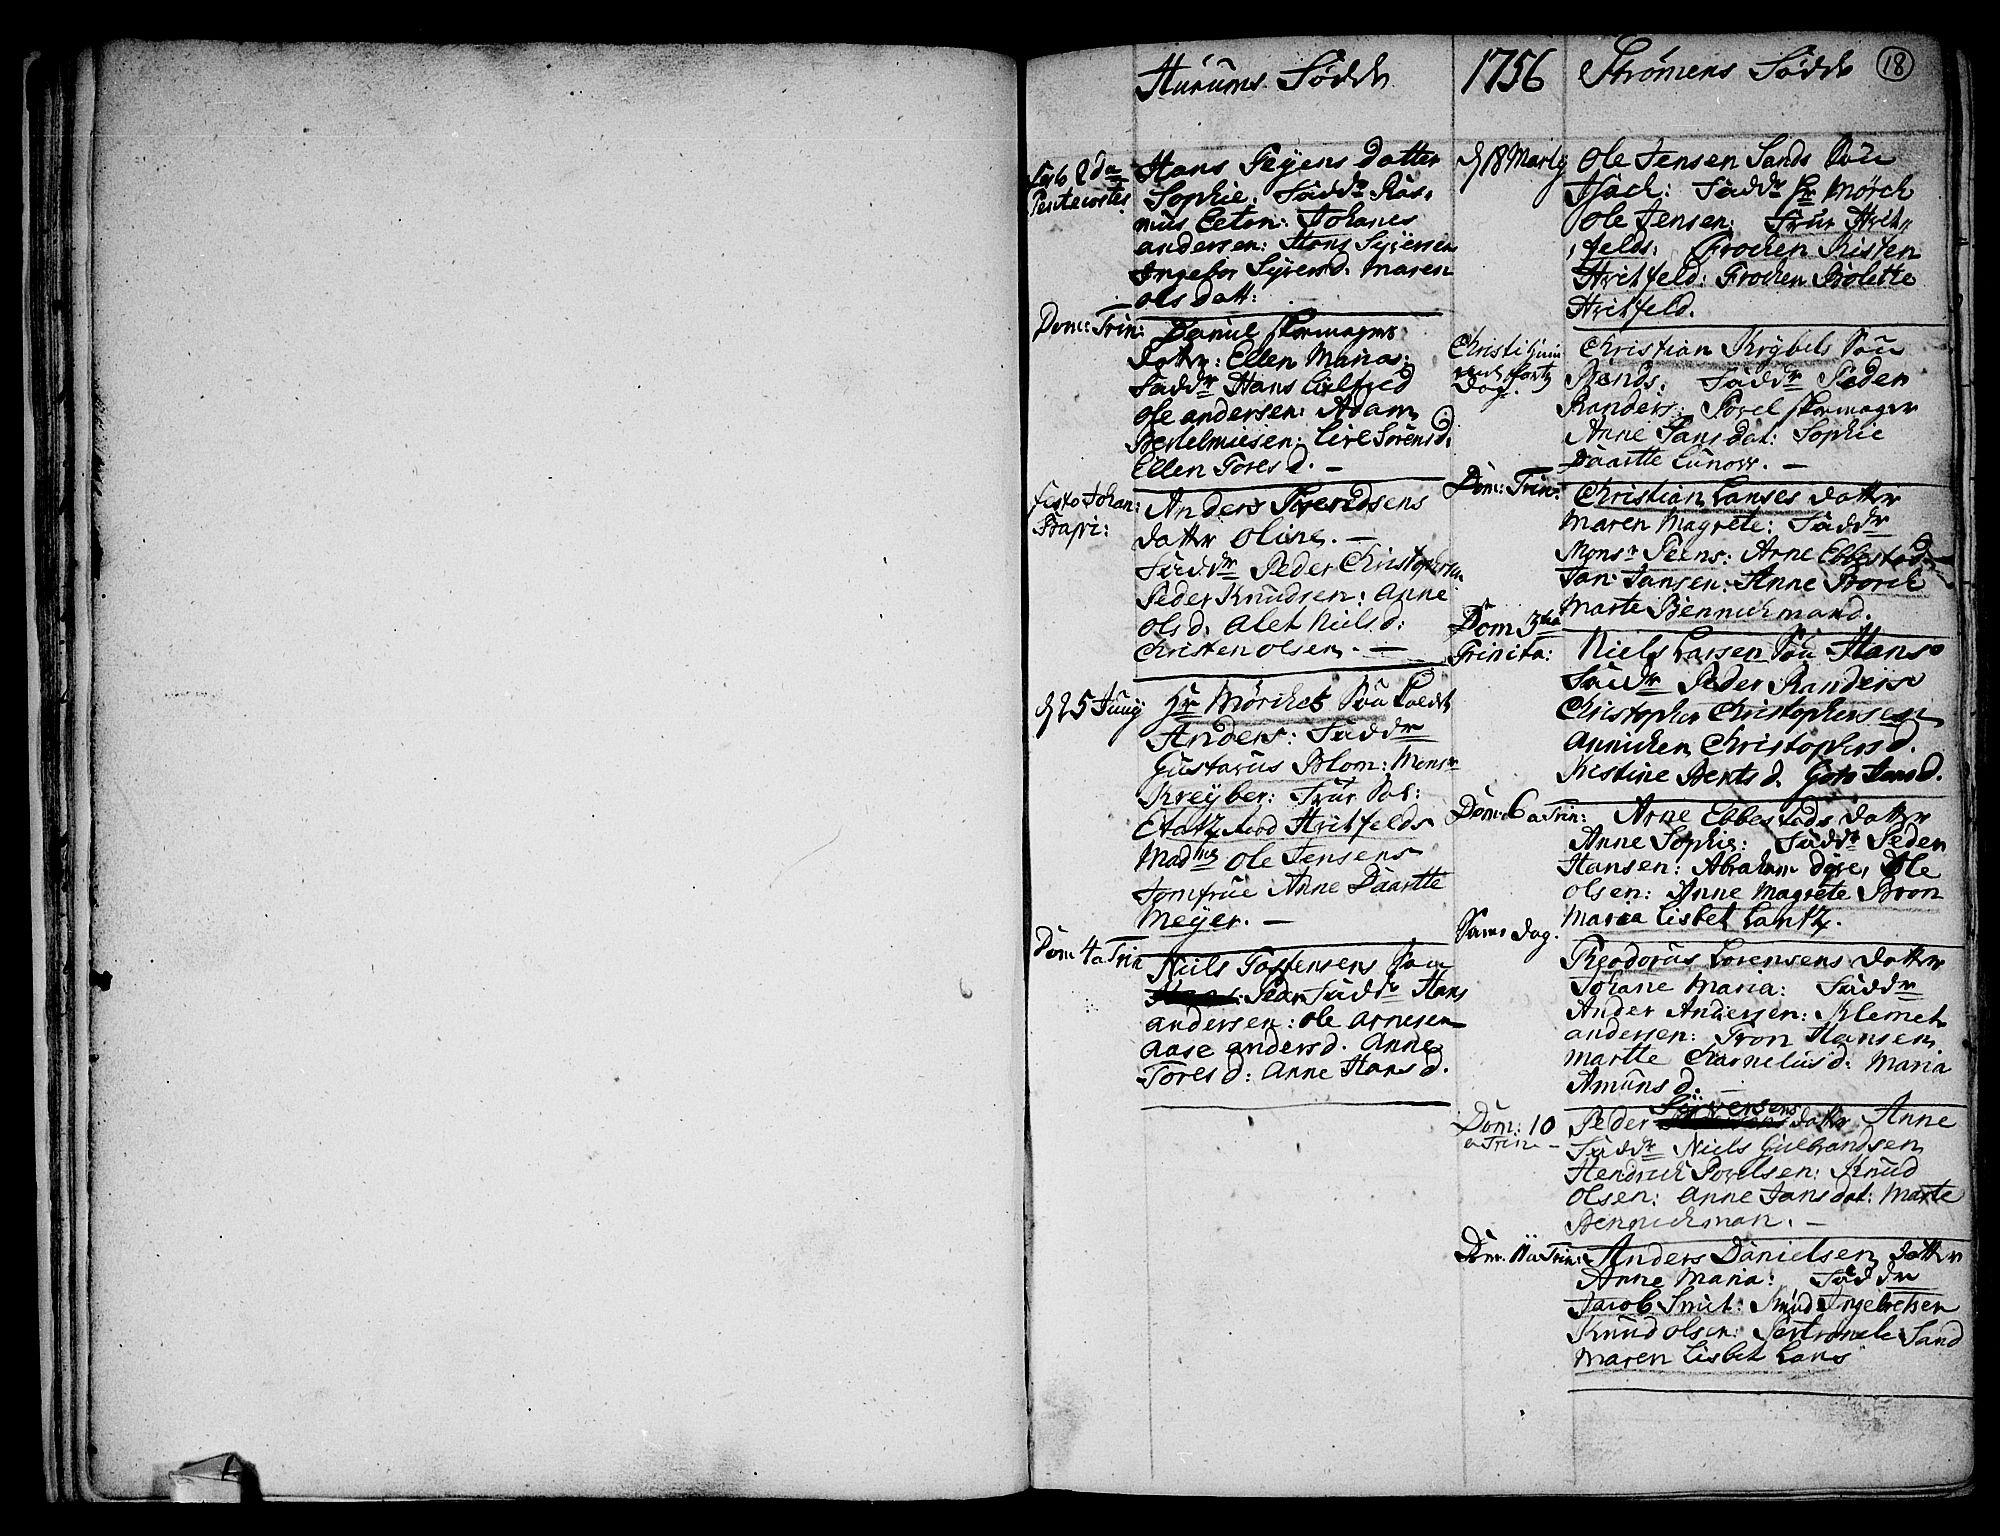 SAKO, Hurum kirkebøker, F/Fa/L0006: Ministerialbok nr. 6, 1756-1770, s. 18